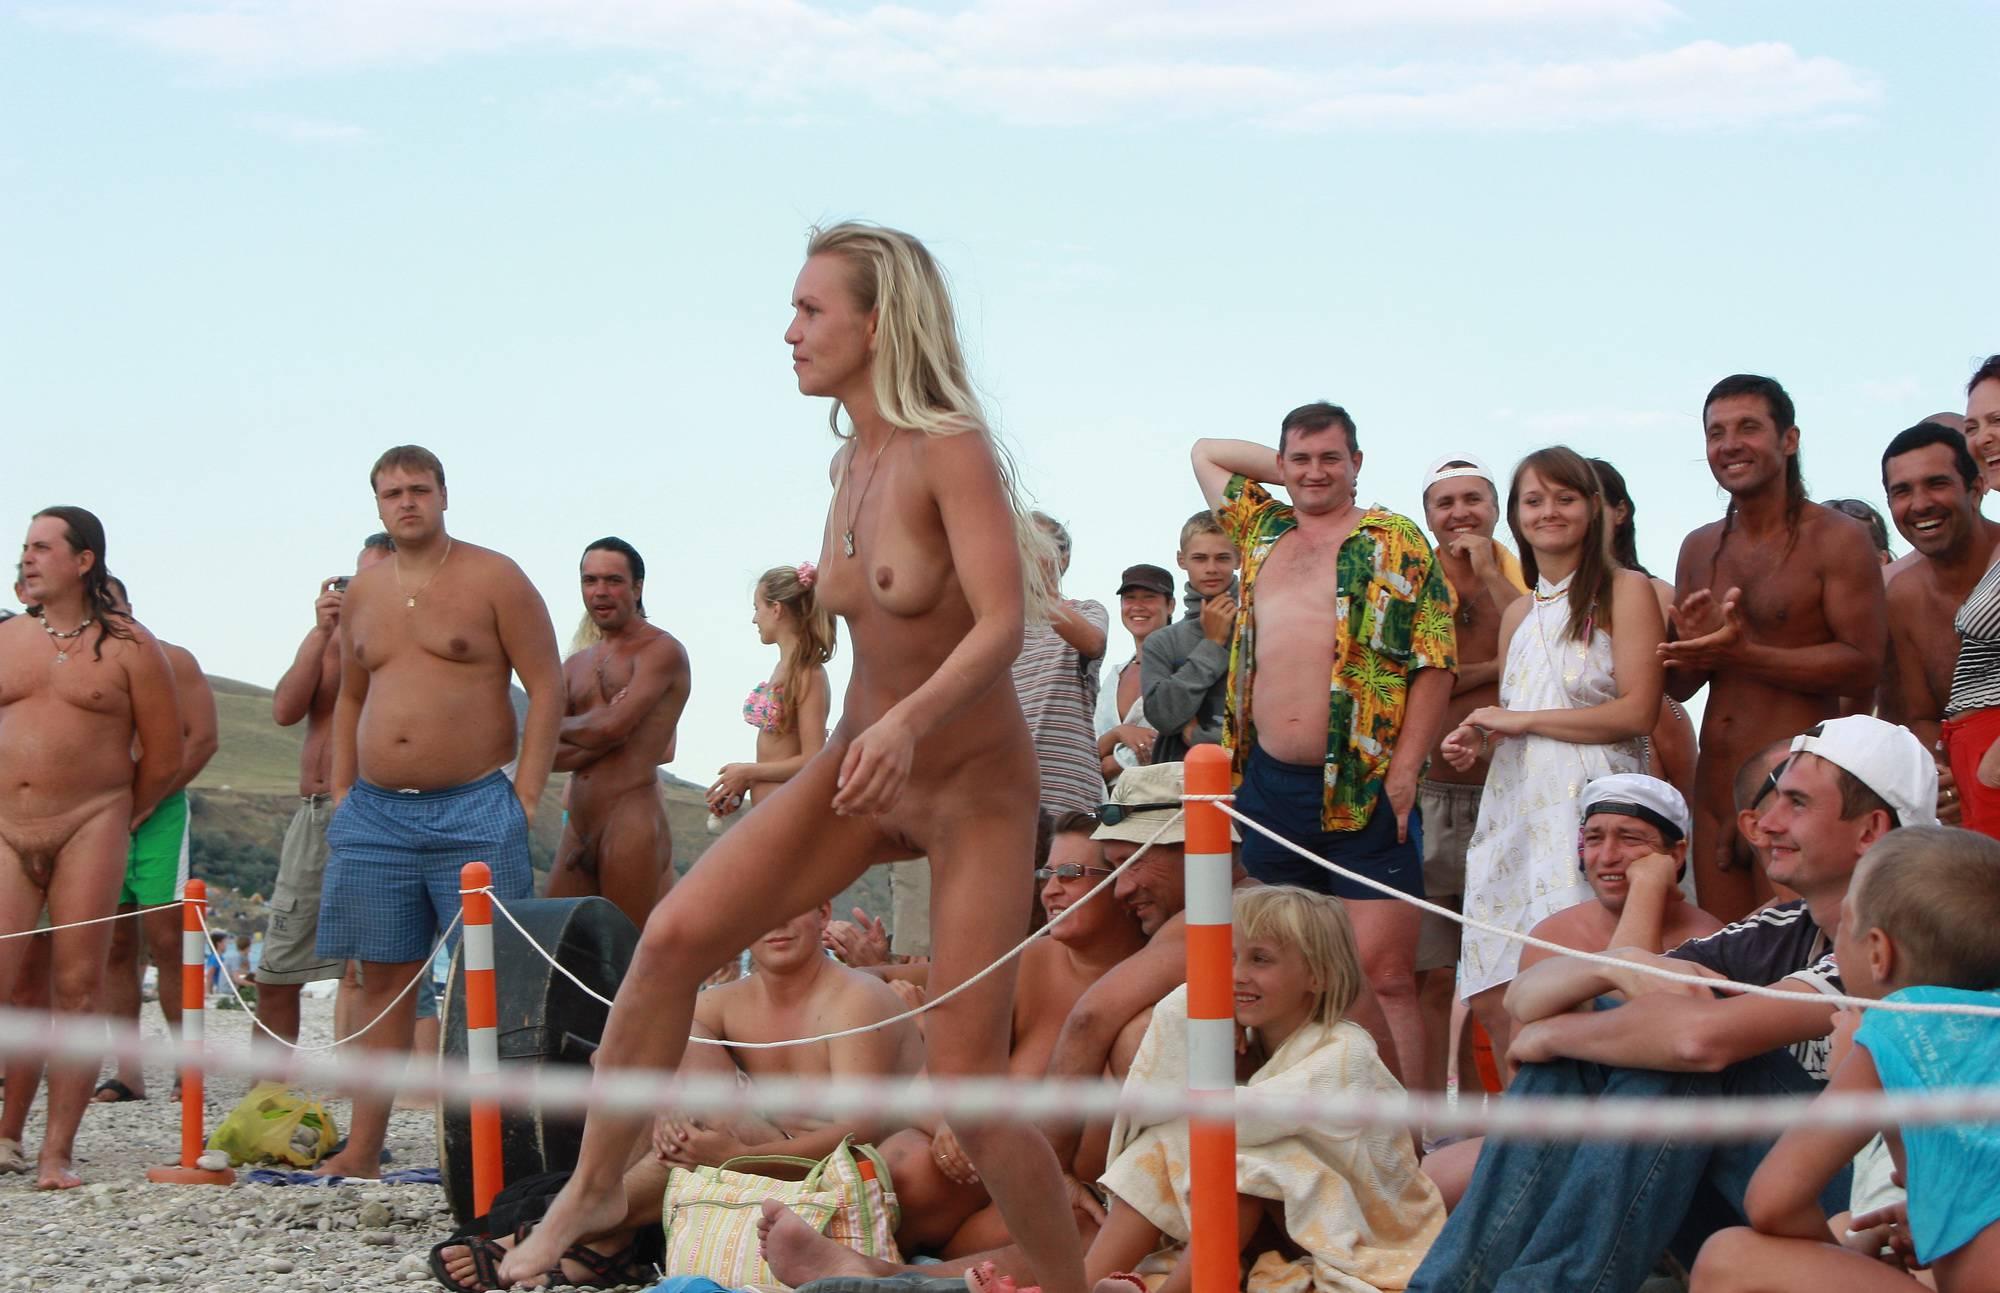 Nudist Pictures Neptune Three Girl Lines - 2